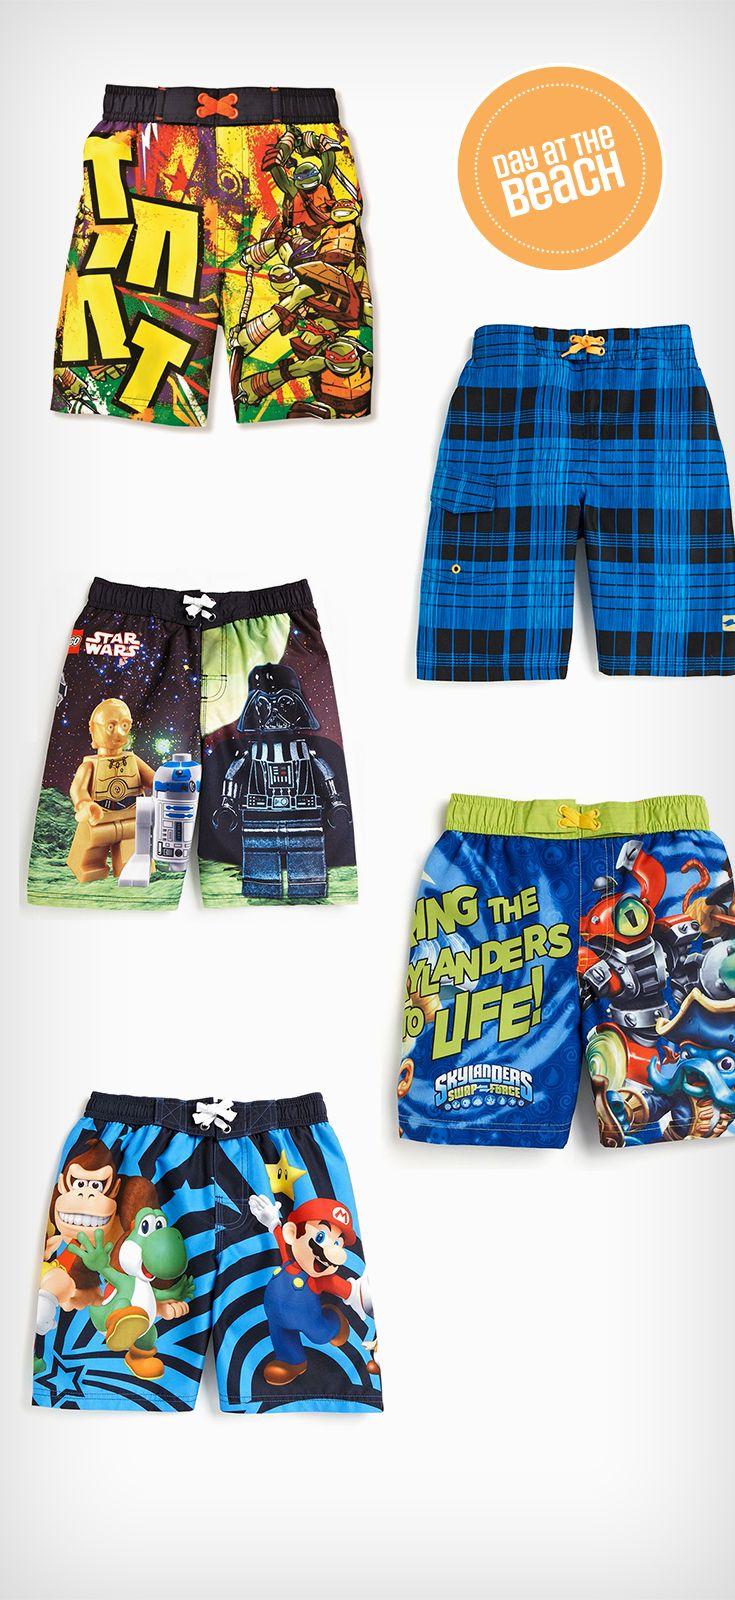 Kid's make a splash in kids' swim fashion: Boy's swimming trunks